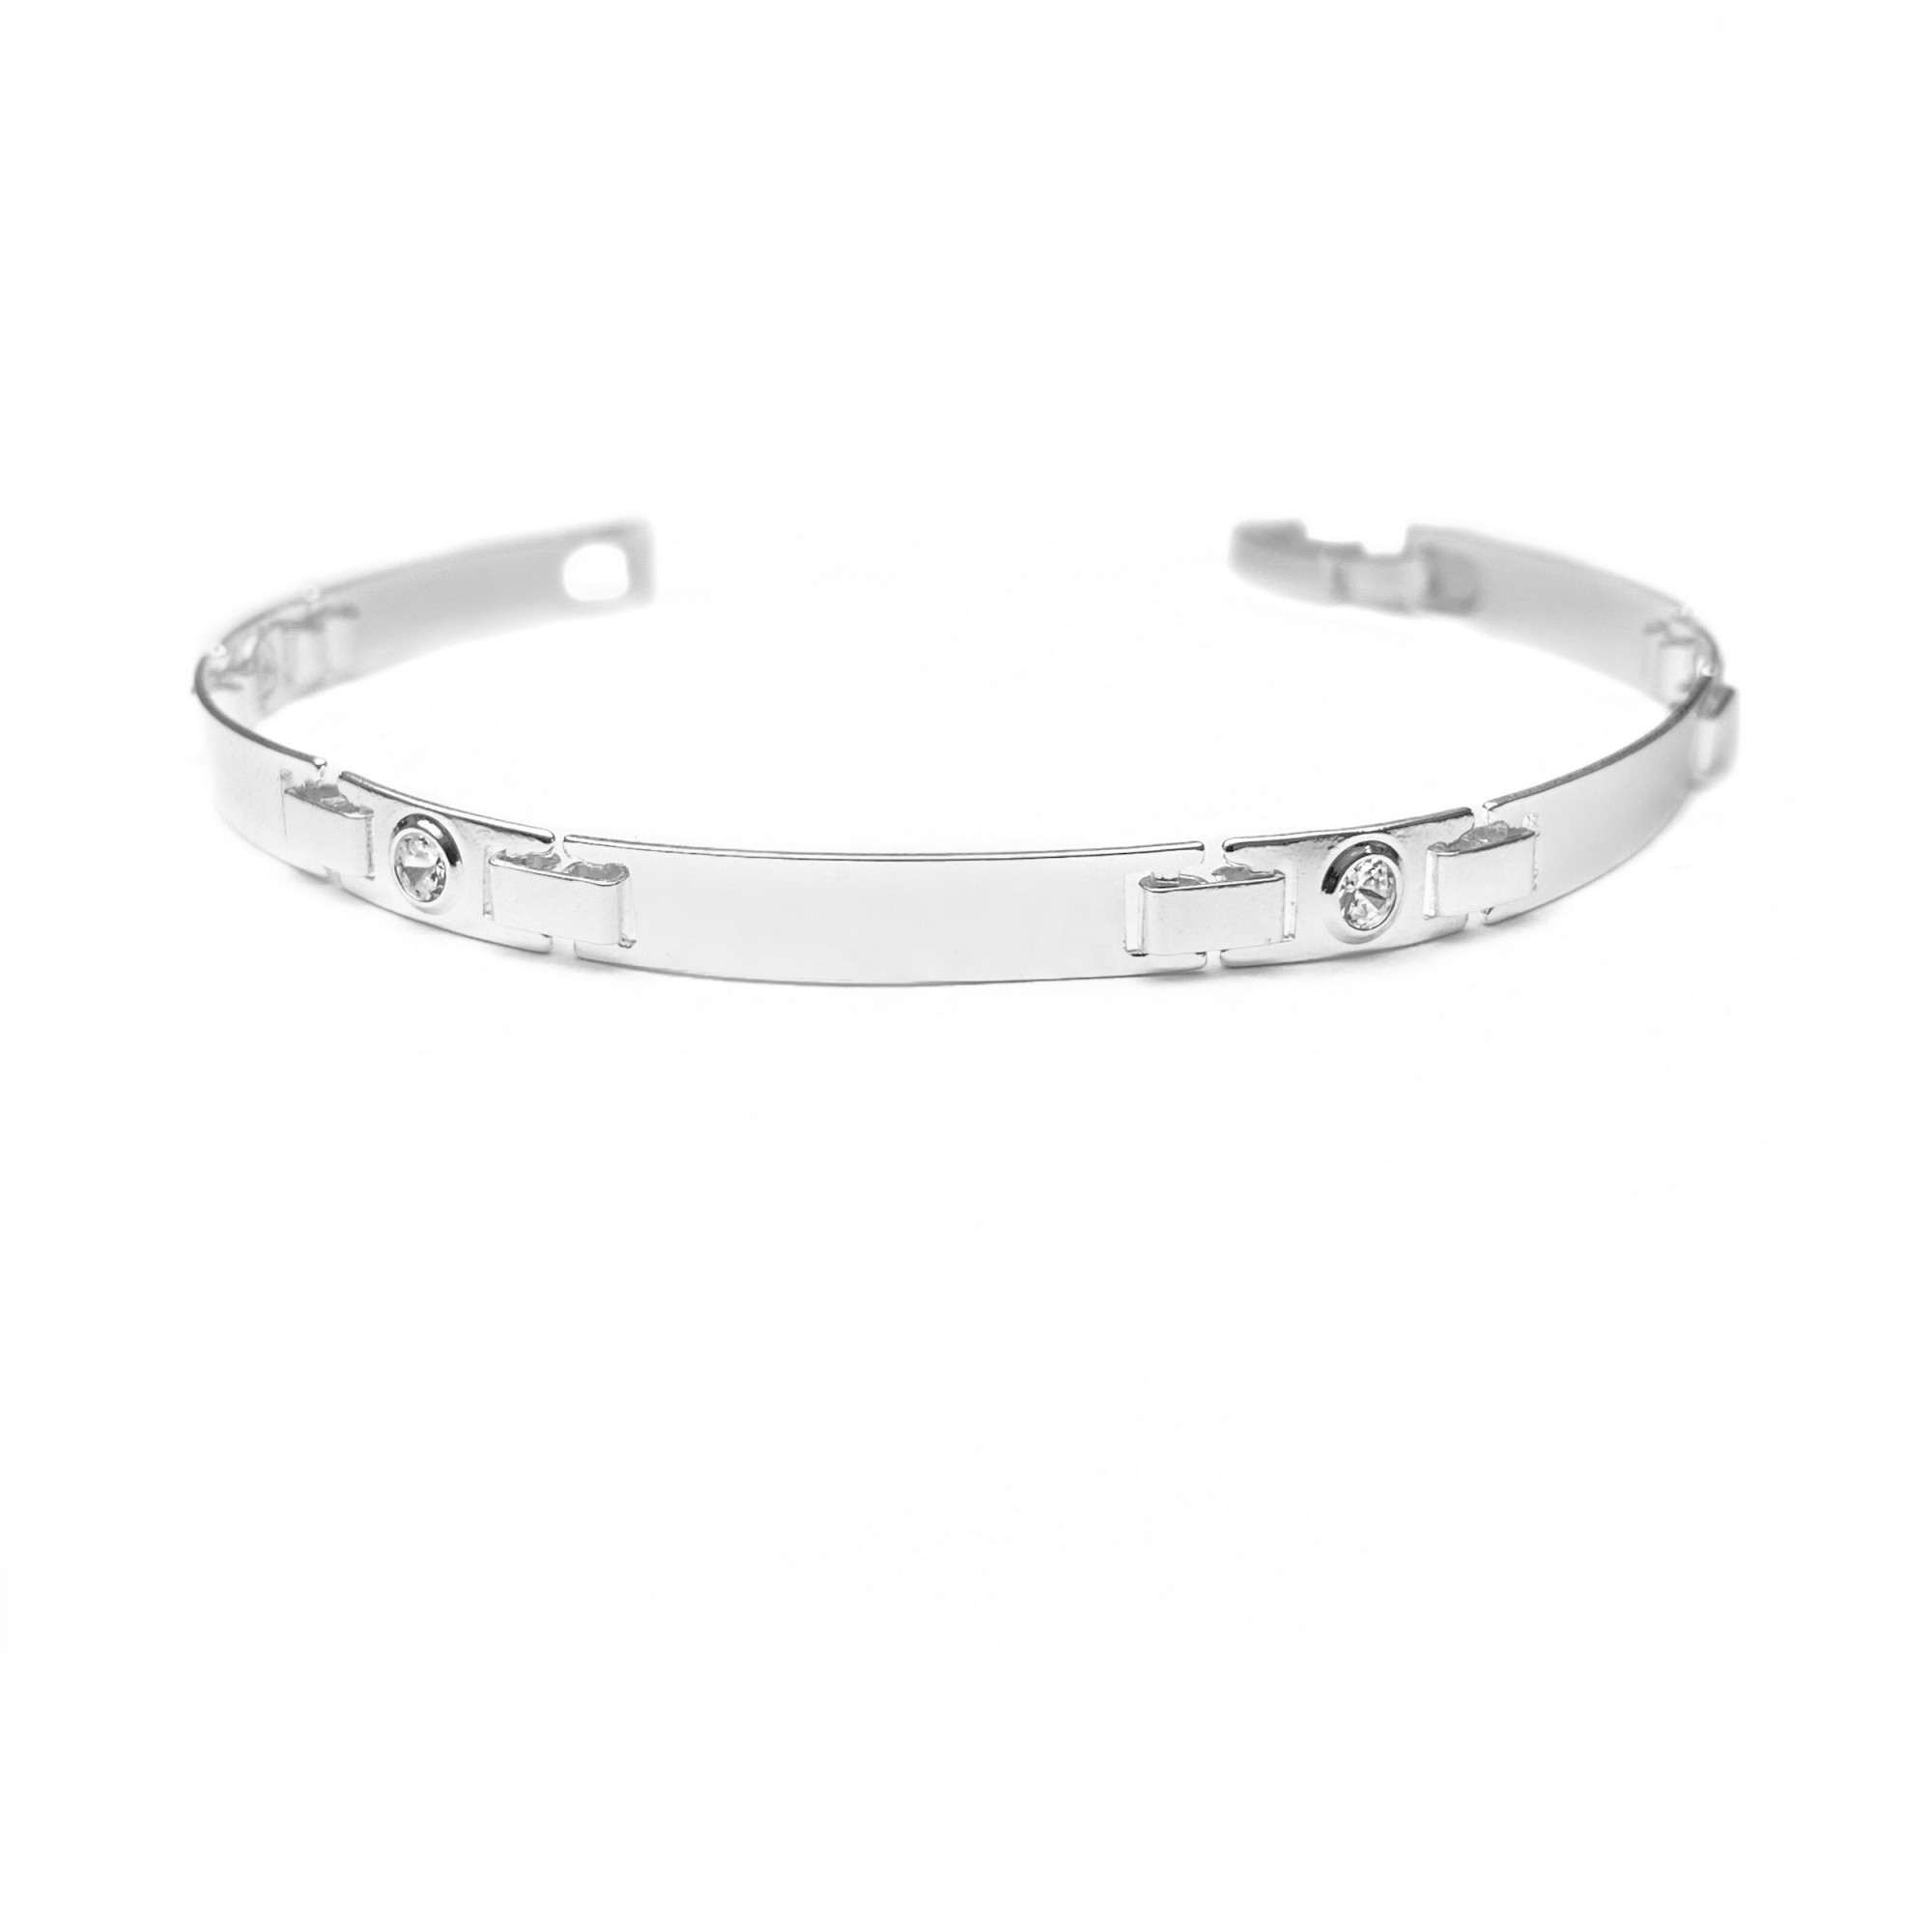 Bracelete Liso Pedra De Zircônia Branca 5mm (Banho De Prata 925)